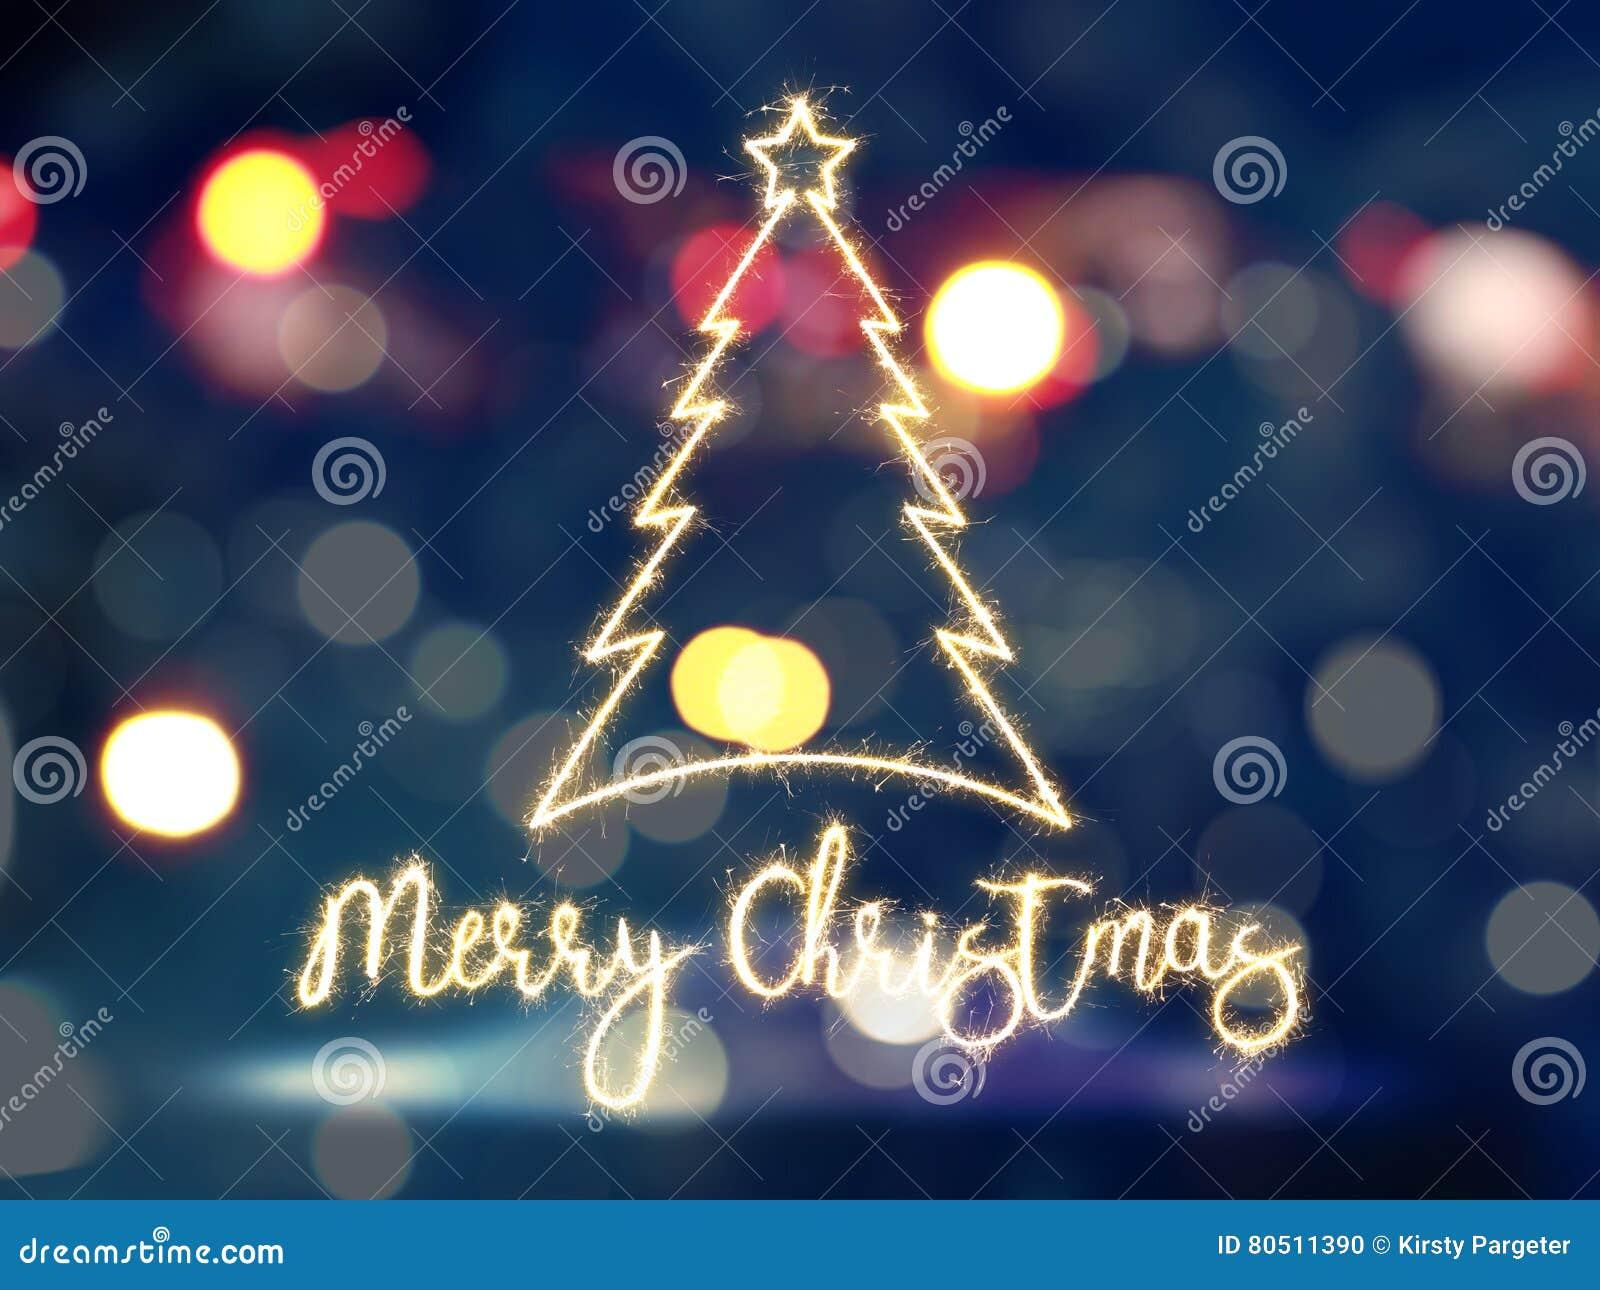 download christmas sparkle bokeh lights stock illustration illustration of xmas festive 80511390